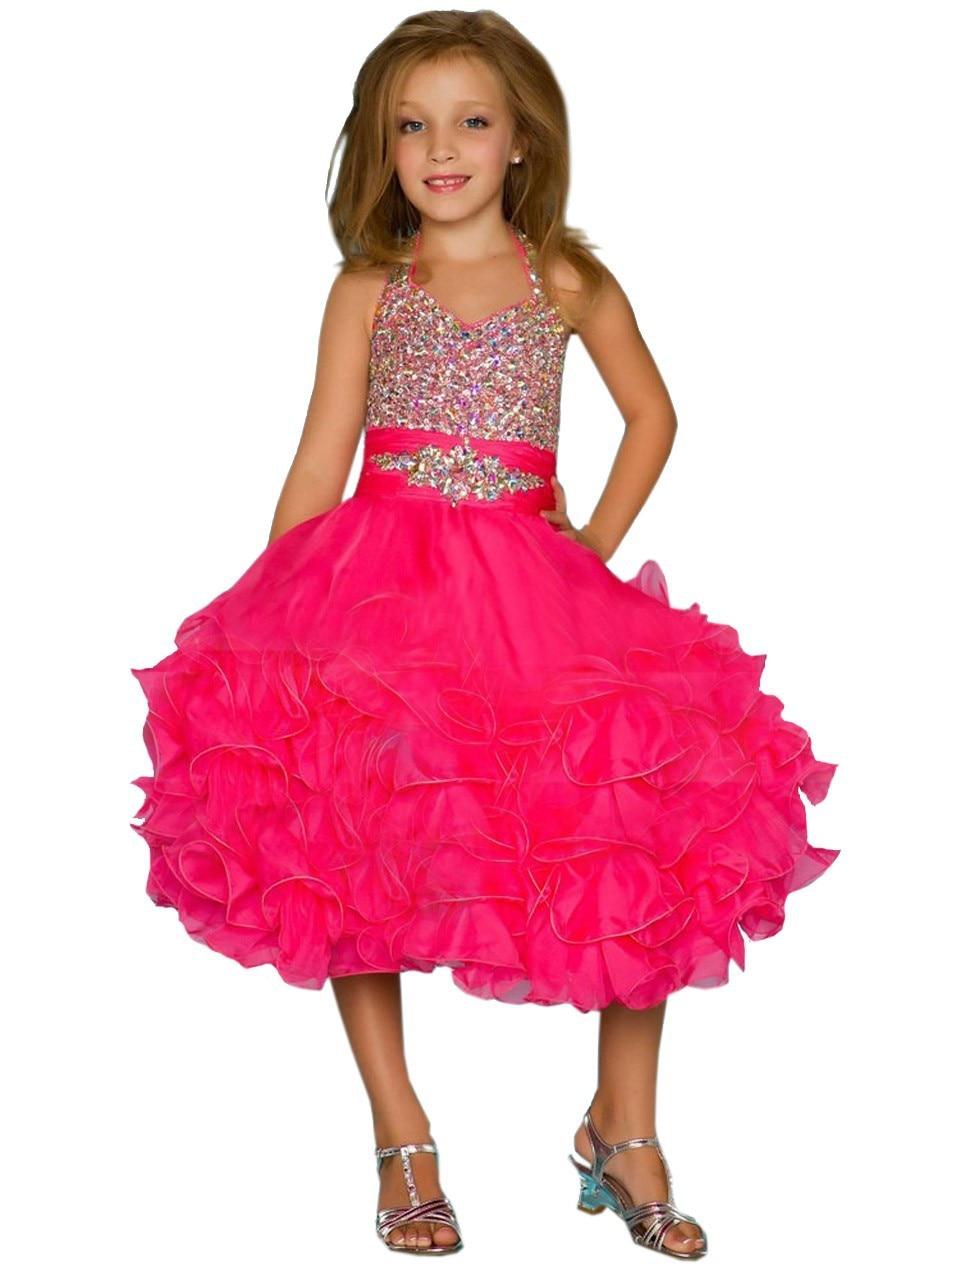 все цены на 2017 Fashion Mother Daughter Dresses Knee-Length Flower Girls Dresses For Wedding Gowns A-Line First Communion Dresses for Girls онлайн